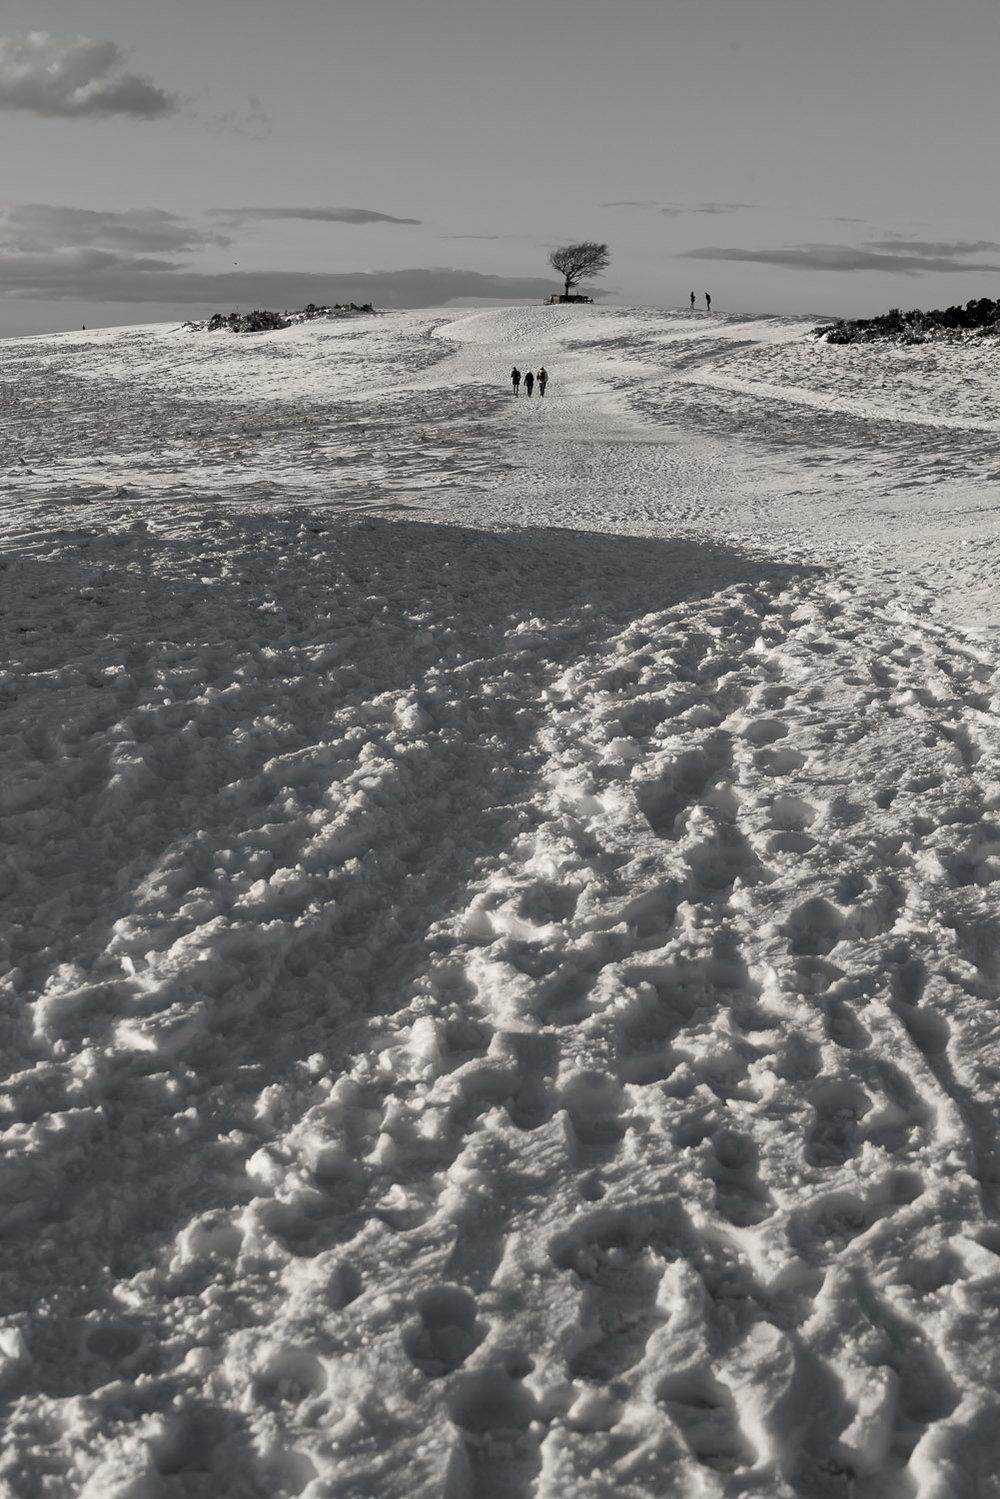 winter-snow-Cleeve-Hill-portrait-Gloucestershire-Jo-Kearney-photos-landscape-photography-video-landscapes.jpg